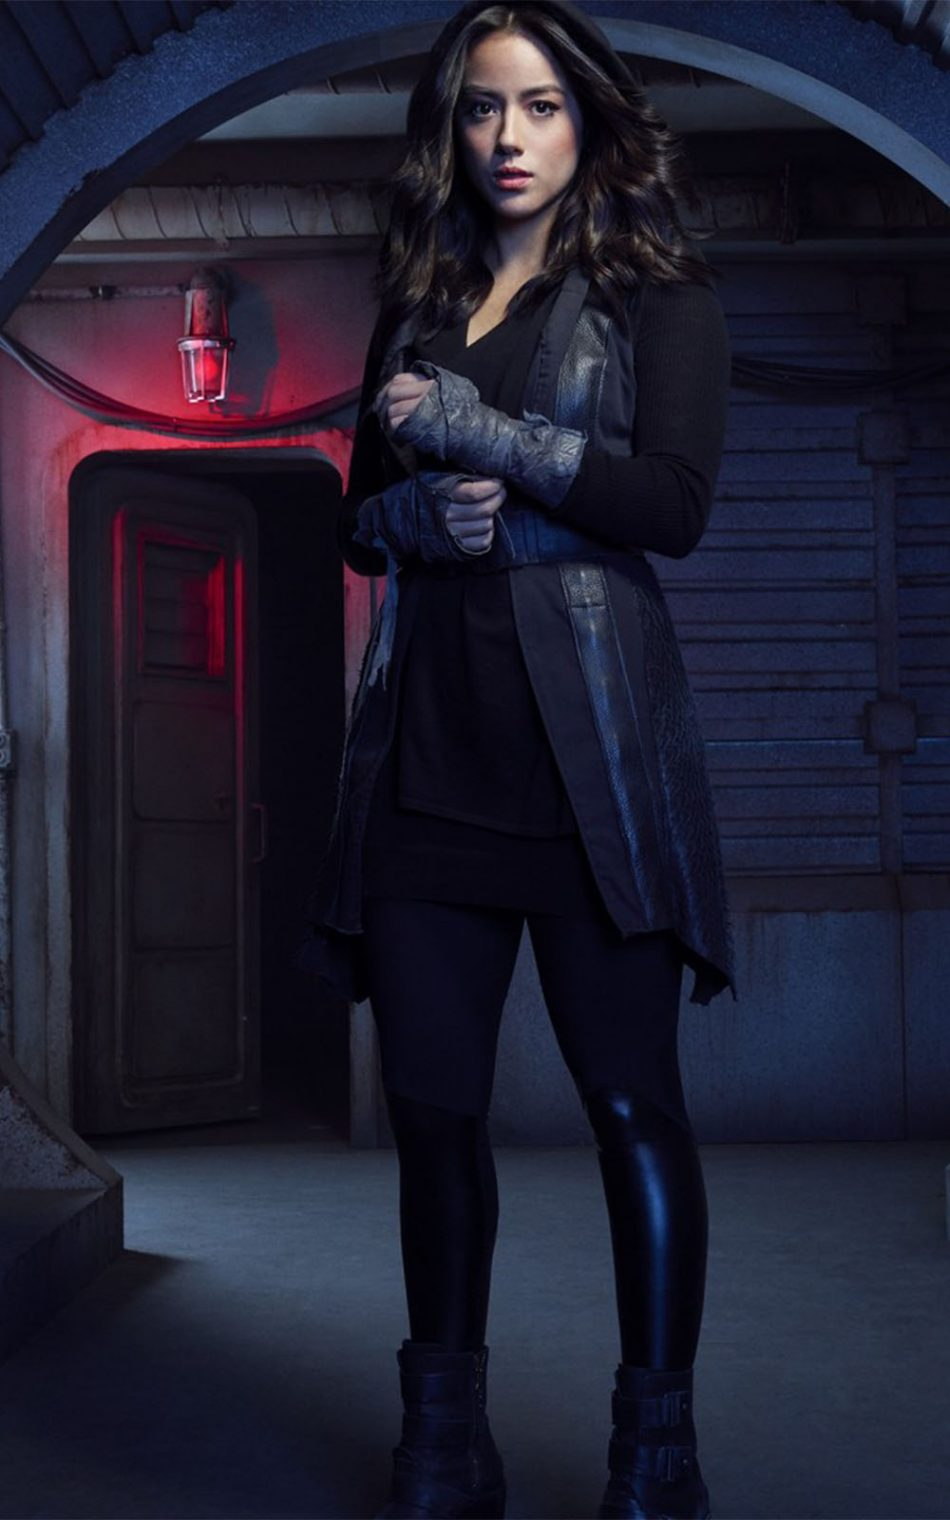 Daisy Johnson In Agents Of Shield Season 5 Free 4k Ultra Hd Mobile